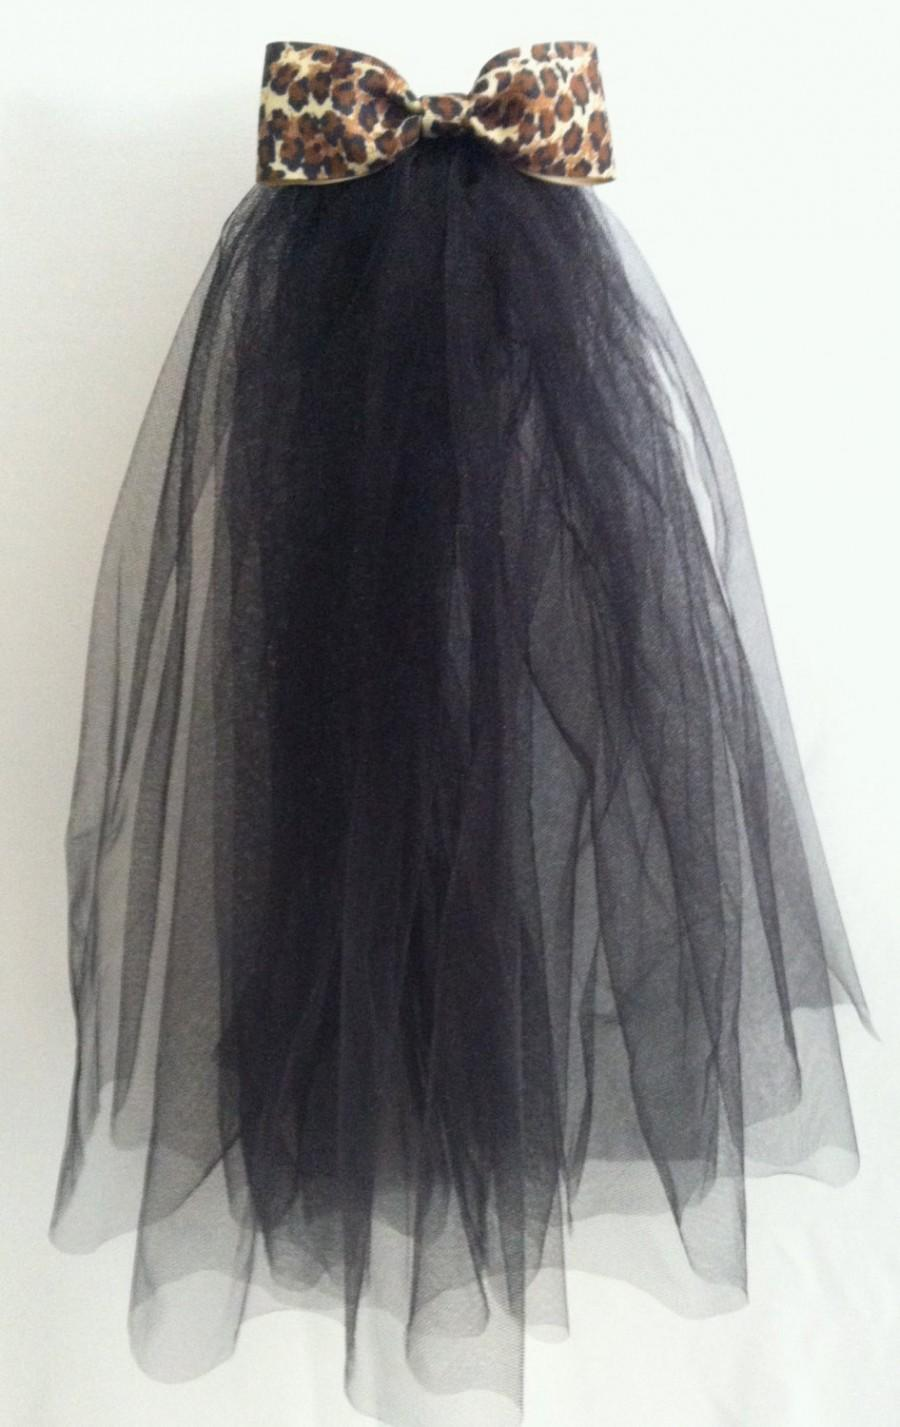 Mariage - Bachelorette Veil - Black w/ Leopard Bow